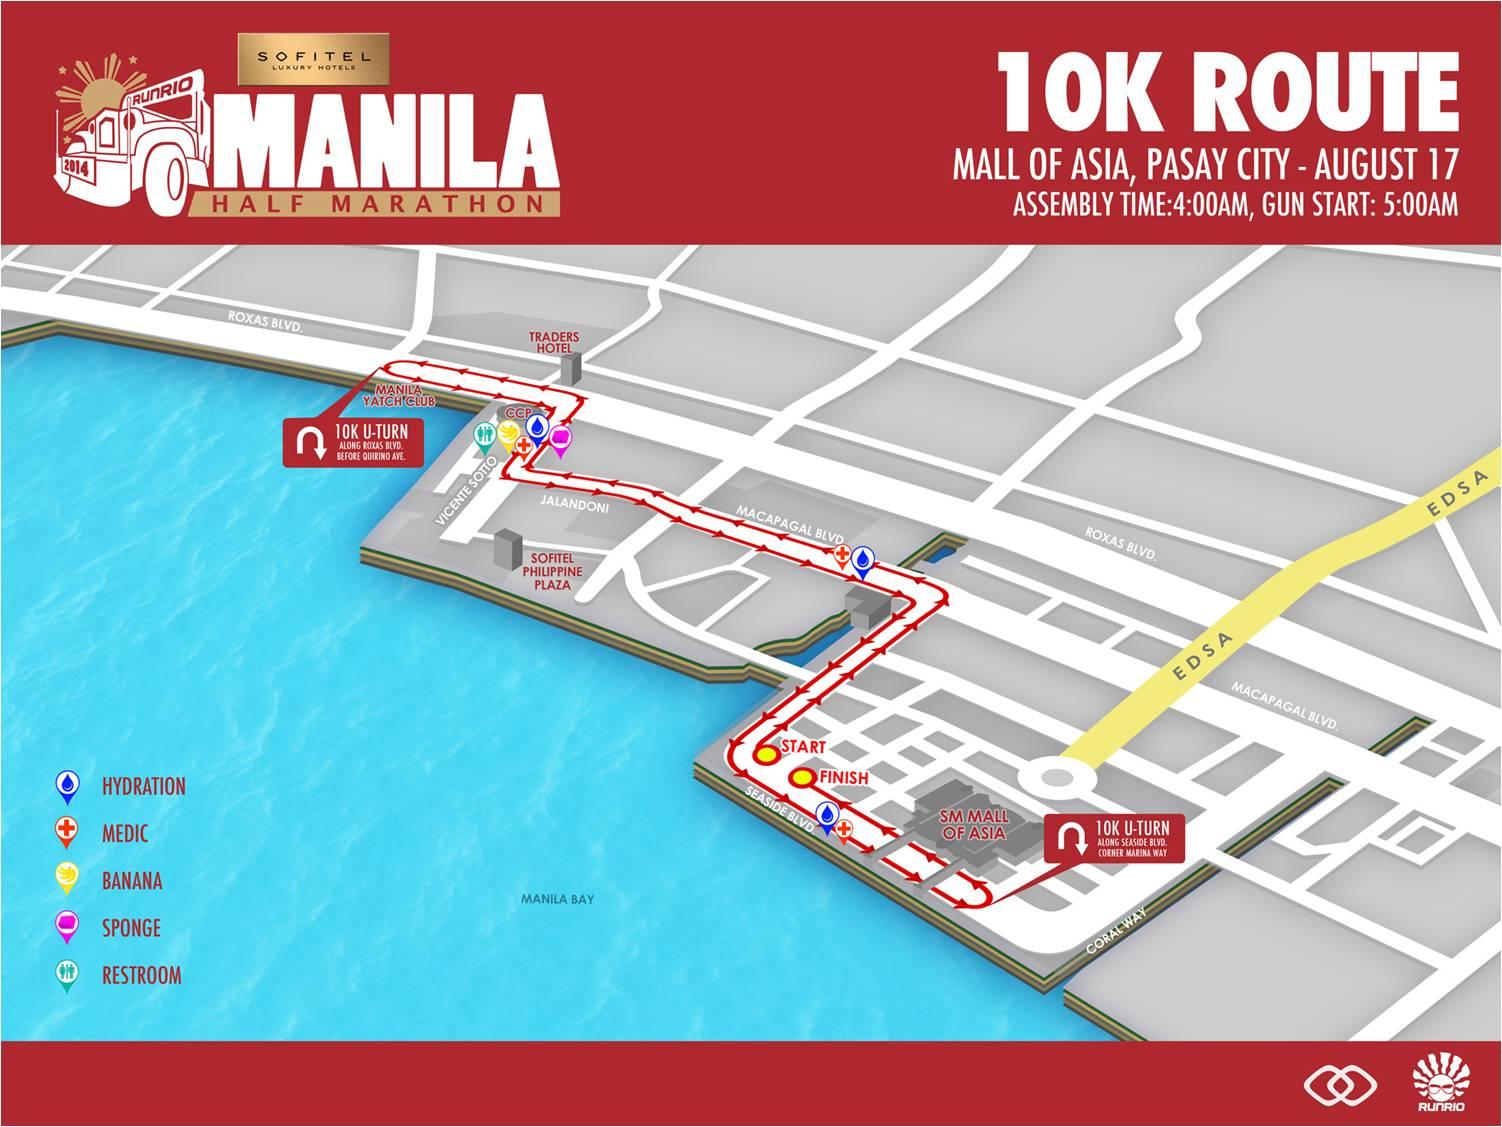 Sofitel Manila Half Marathon 10k route